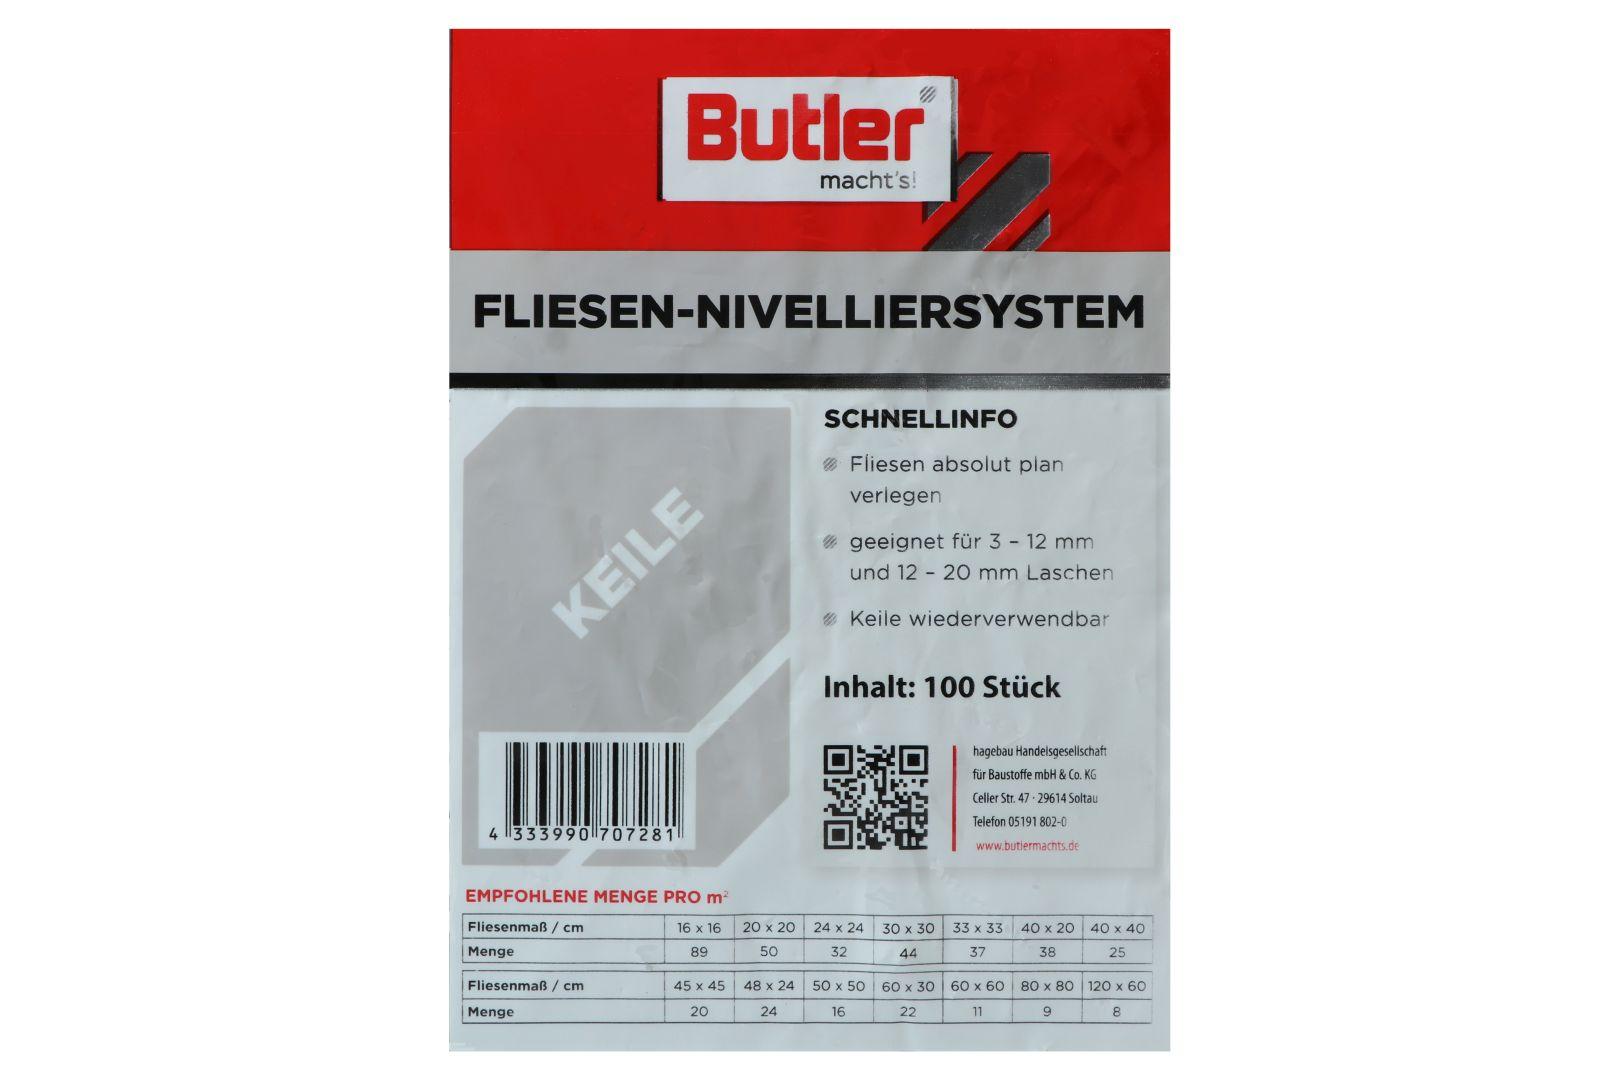 Butler macht's! Fliesen-Nivelliersystem Keile, 100 Stück